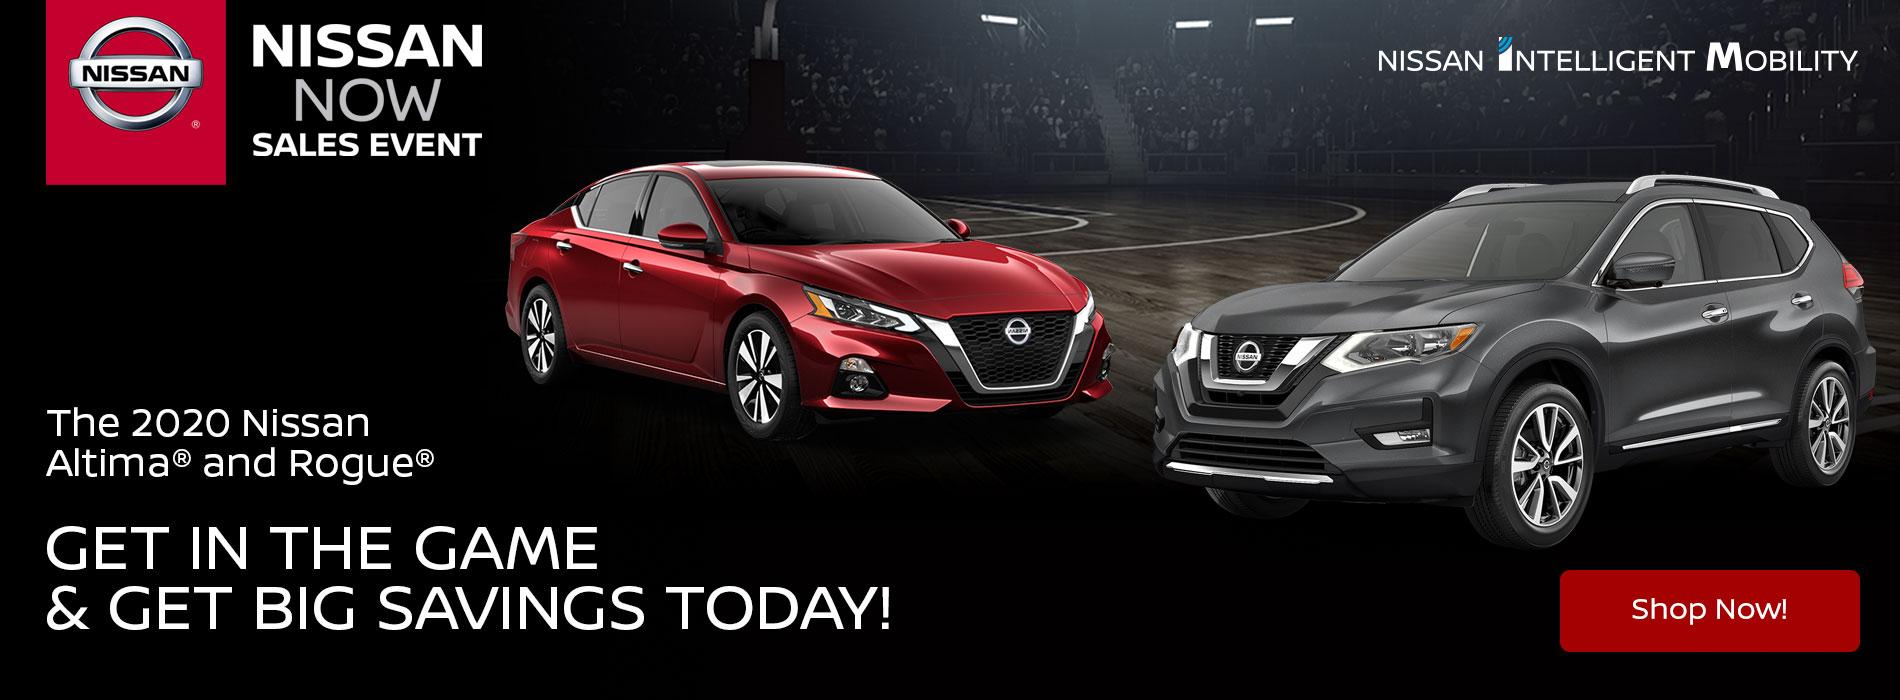 Nissan Now Sales Event